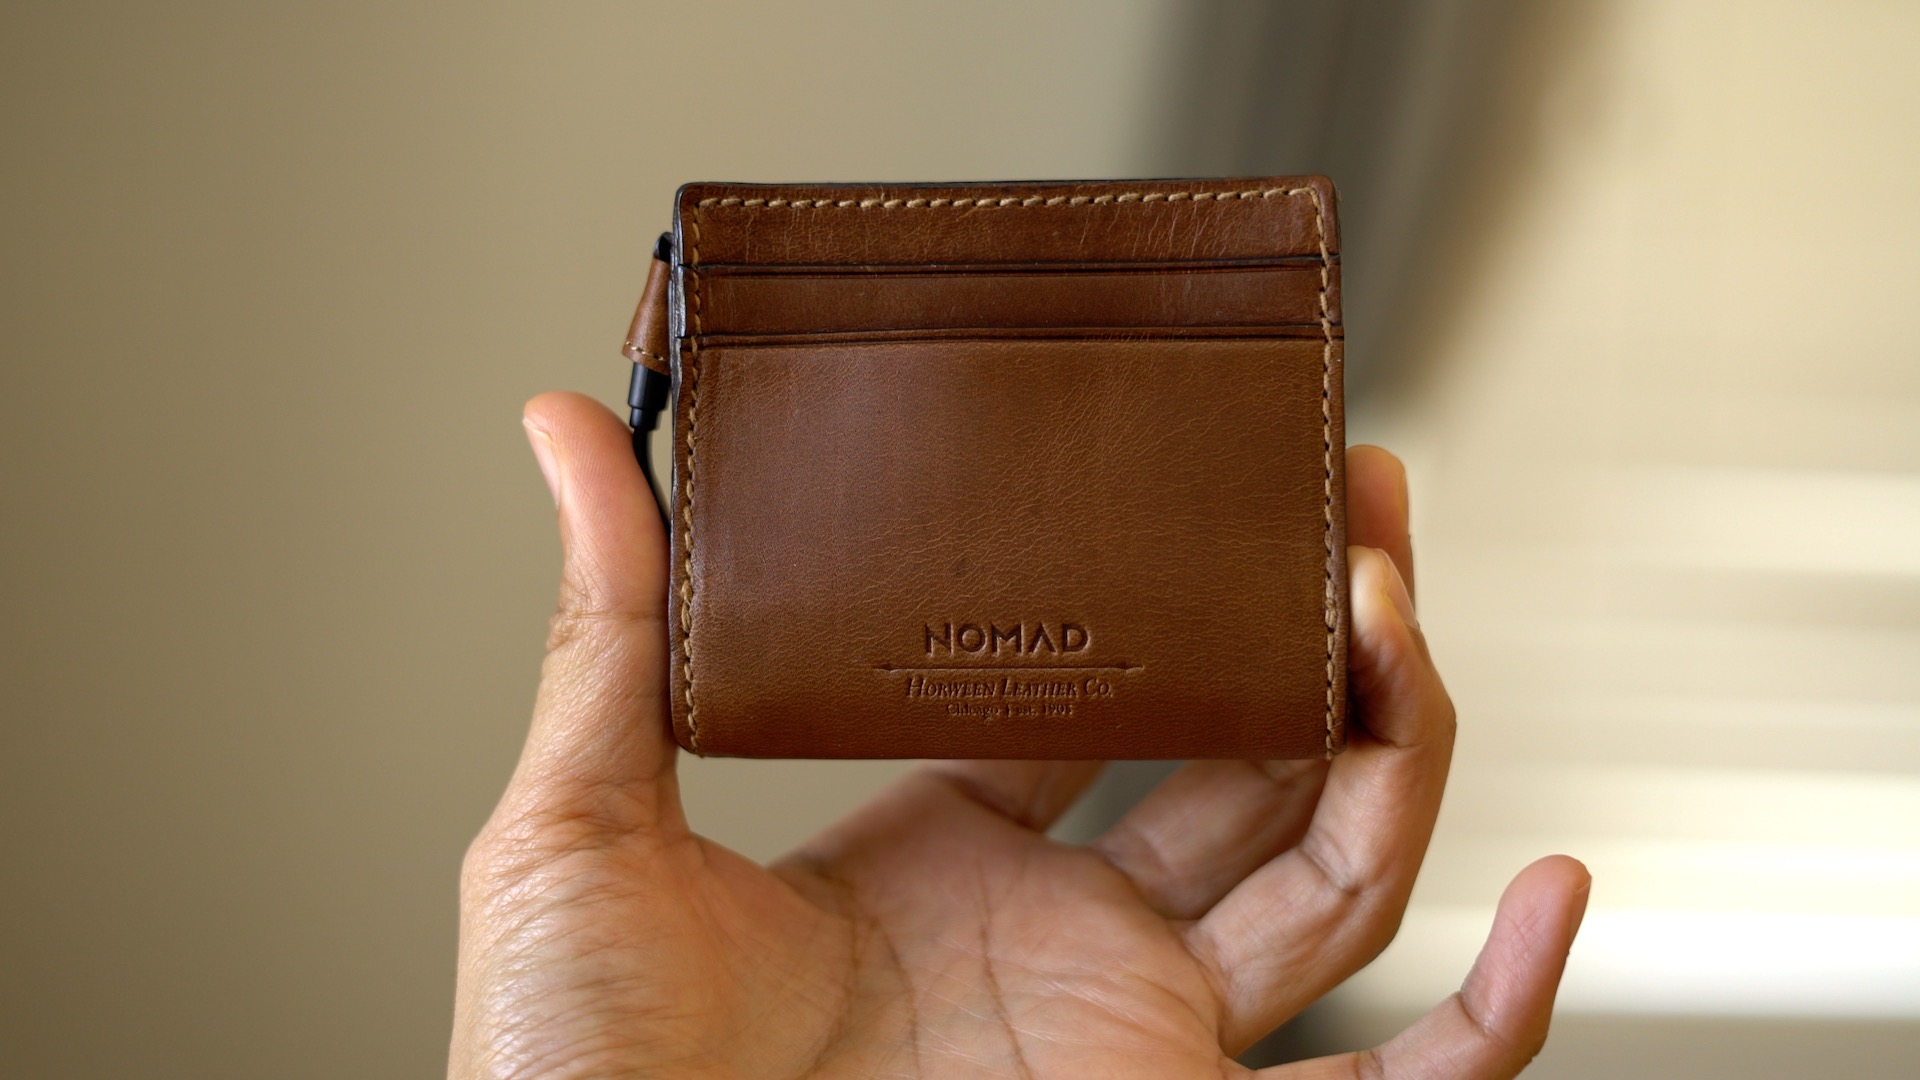 nomad-wallet-youtube